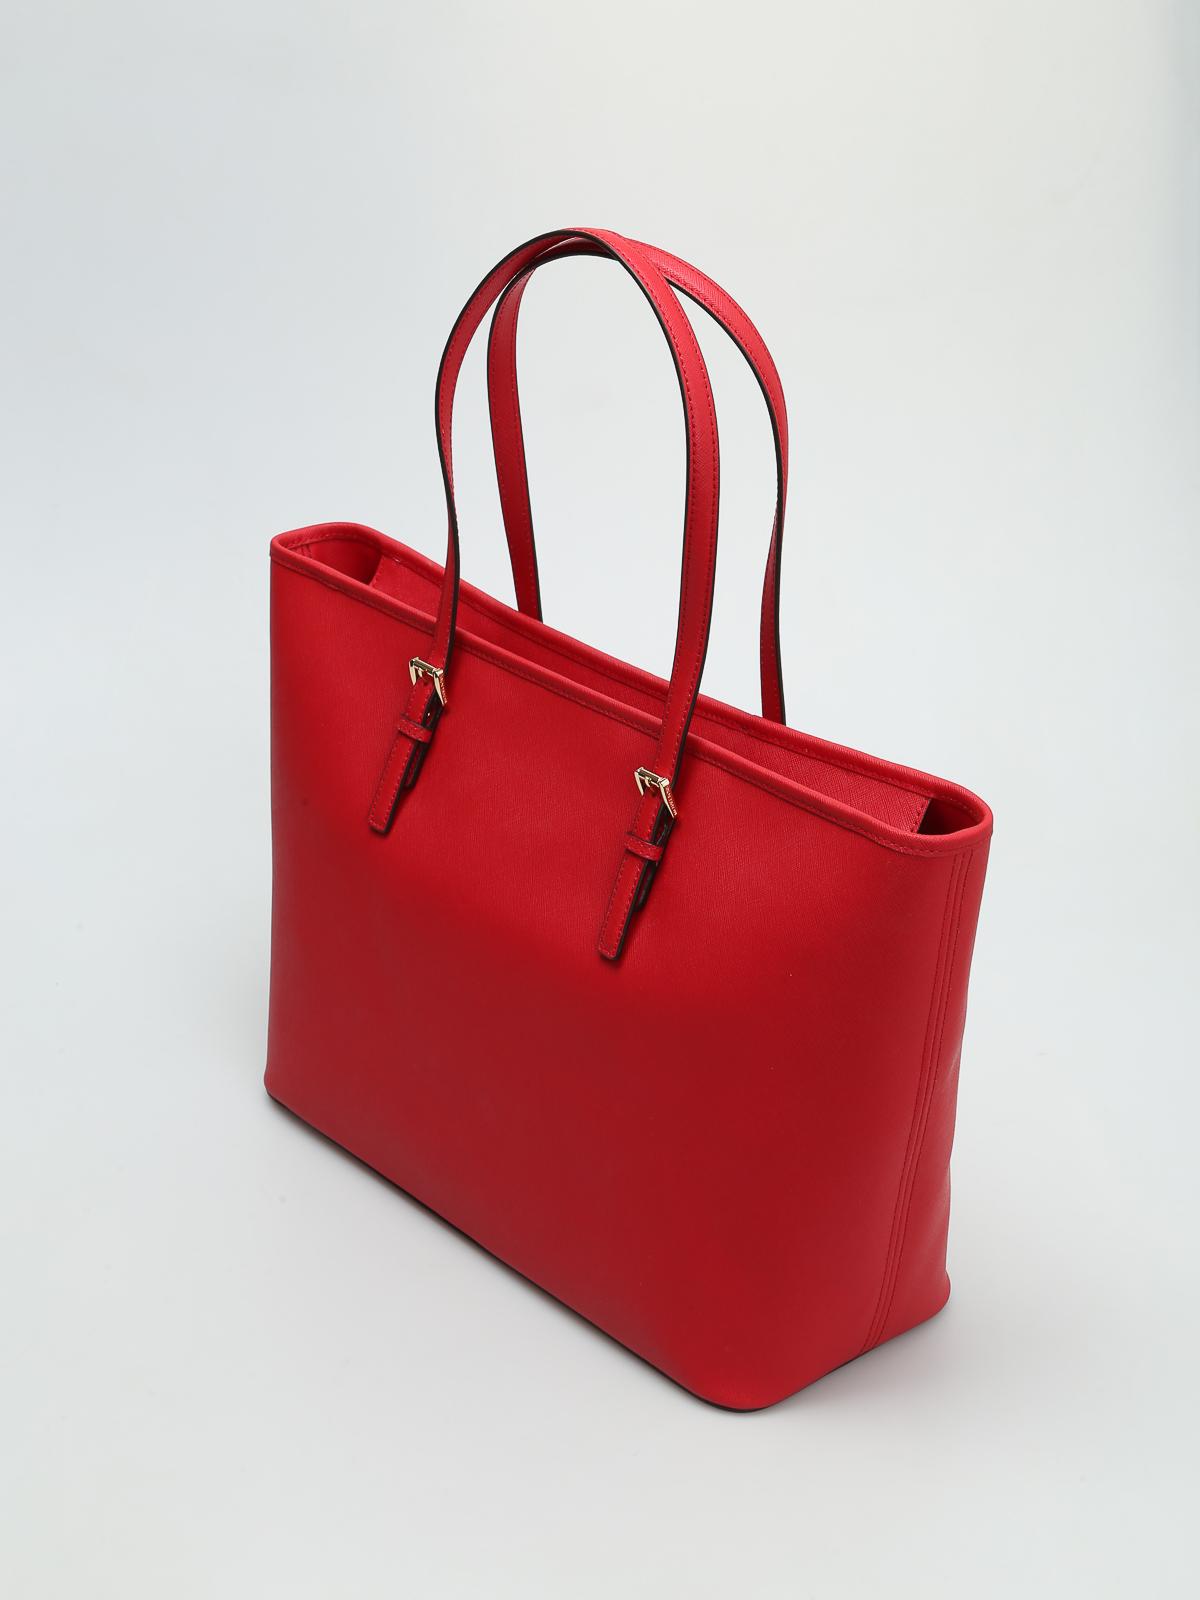 69dbcedf34dd72 Michael Kors - Jet Set Travel medium tote - totes bags - 30T5GTVT2L 204